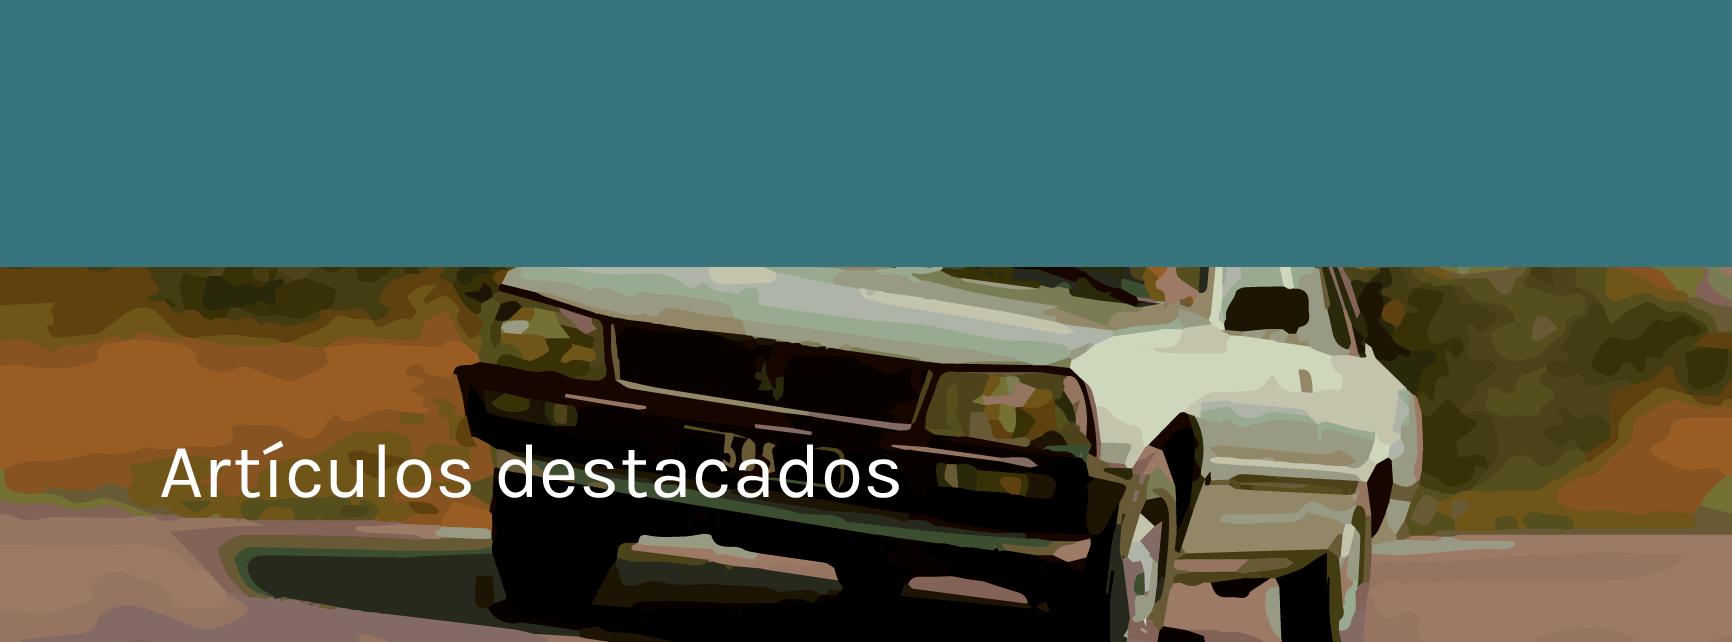 Foro del Peugeot 505 en España